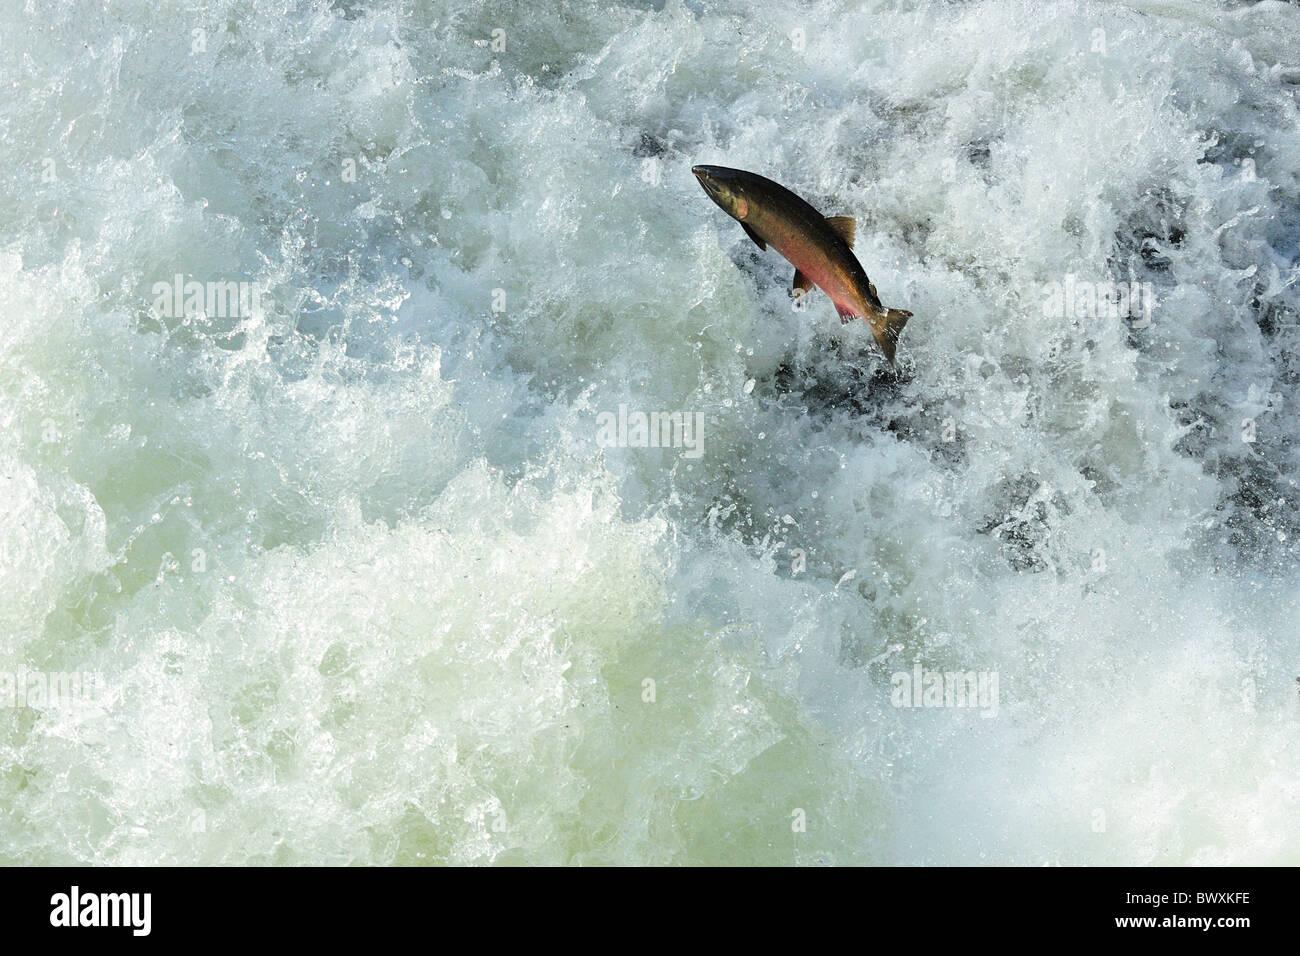 Ou argent coho, Oncorhynchus kisutch, Sol Duc River, Olympic National Park, Washington Photo Stock